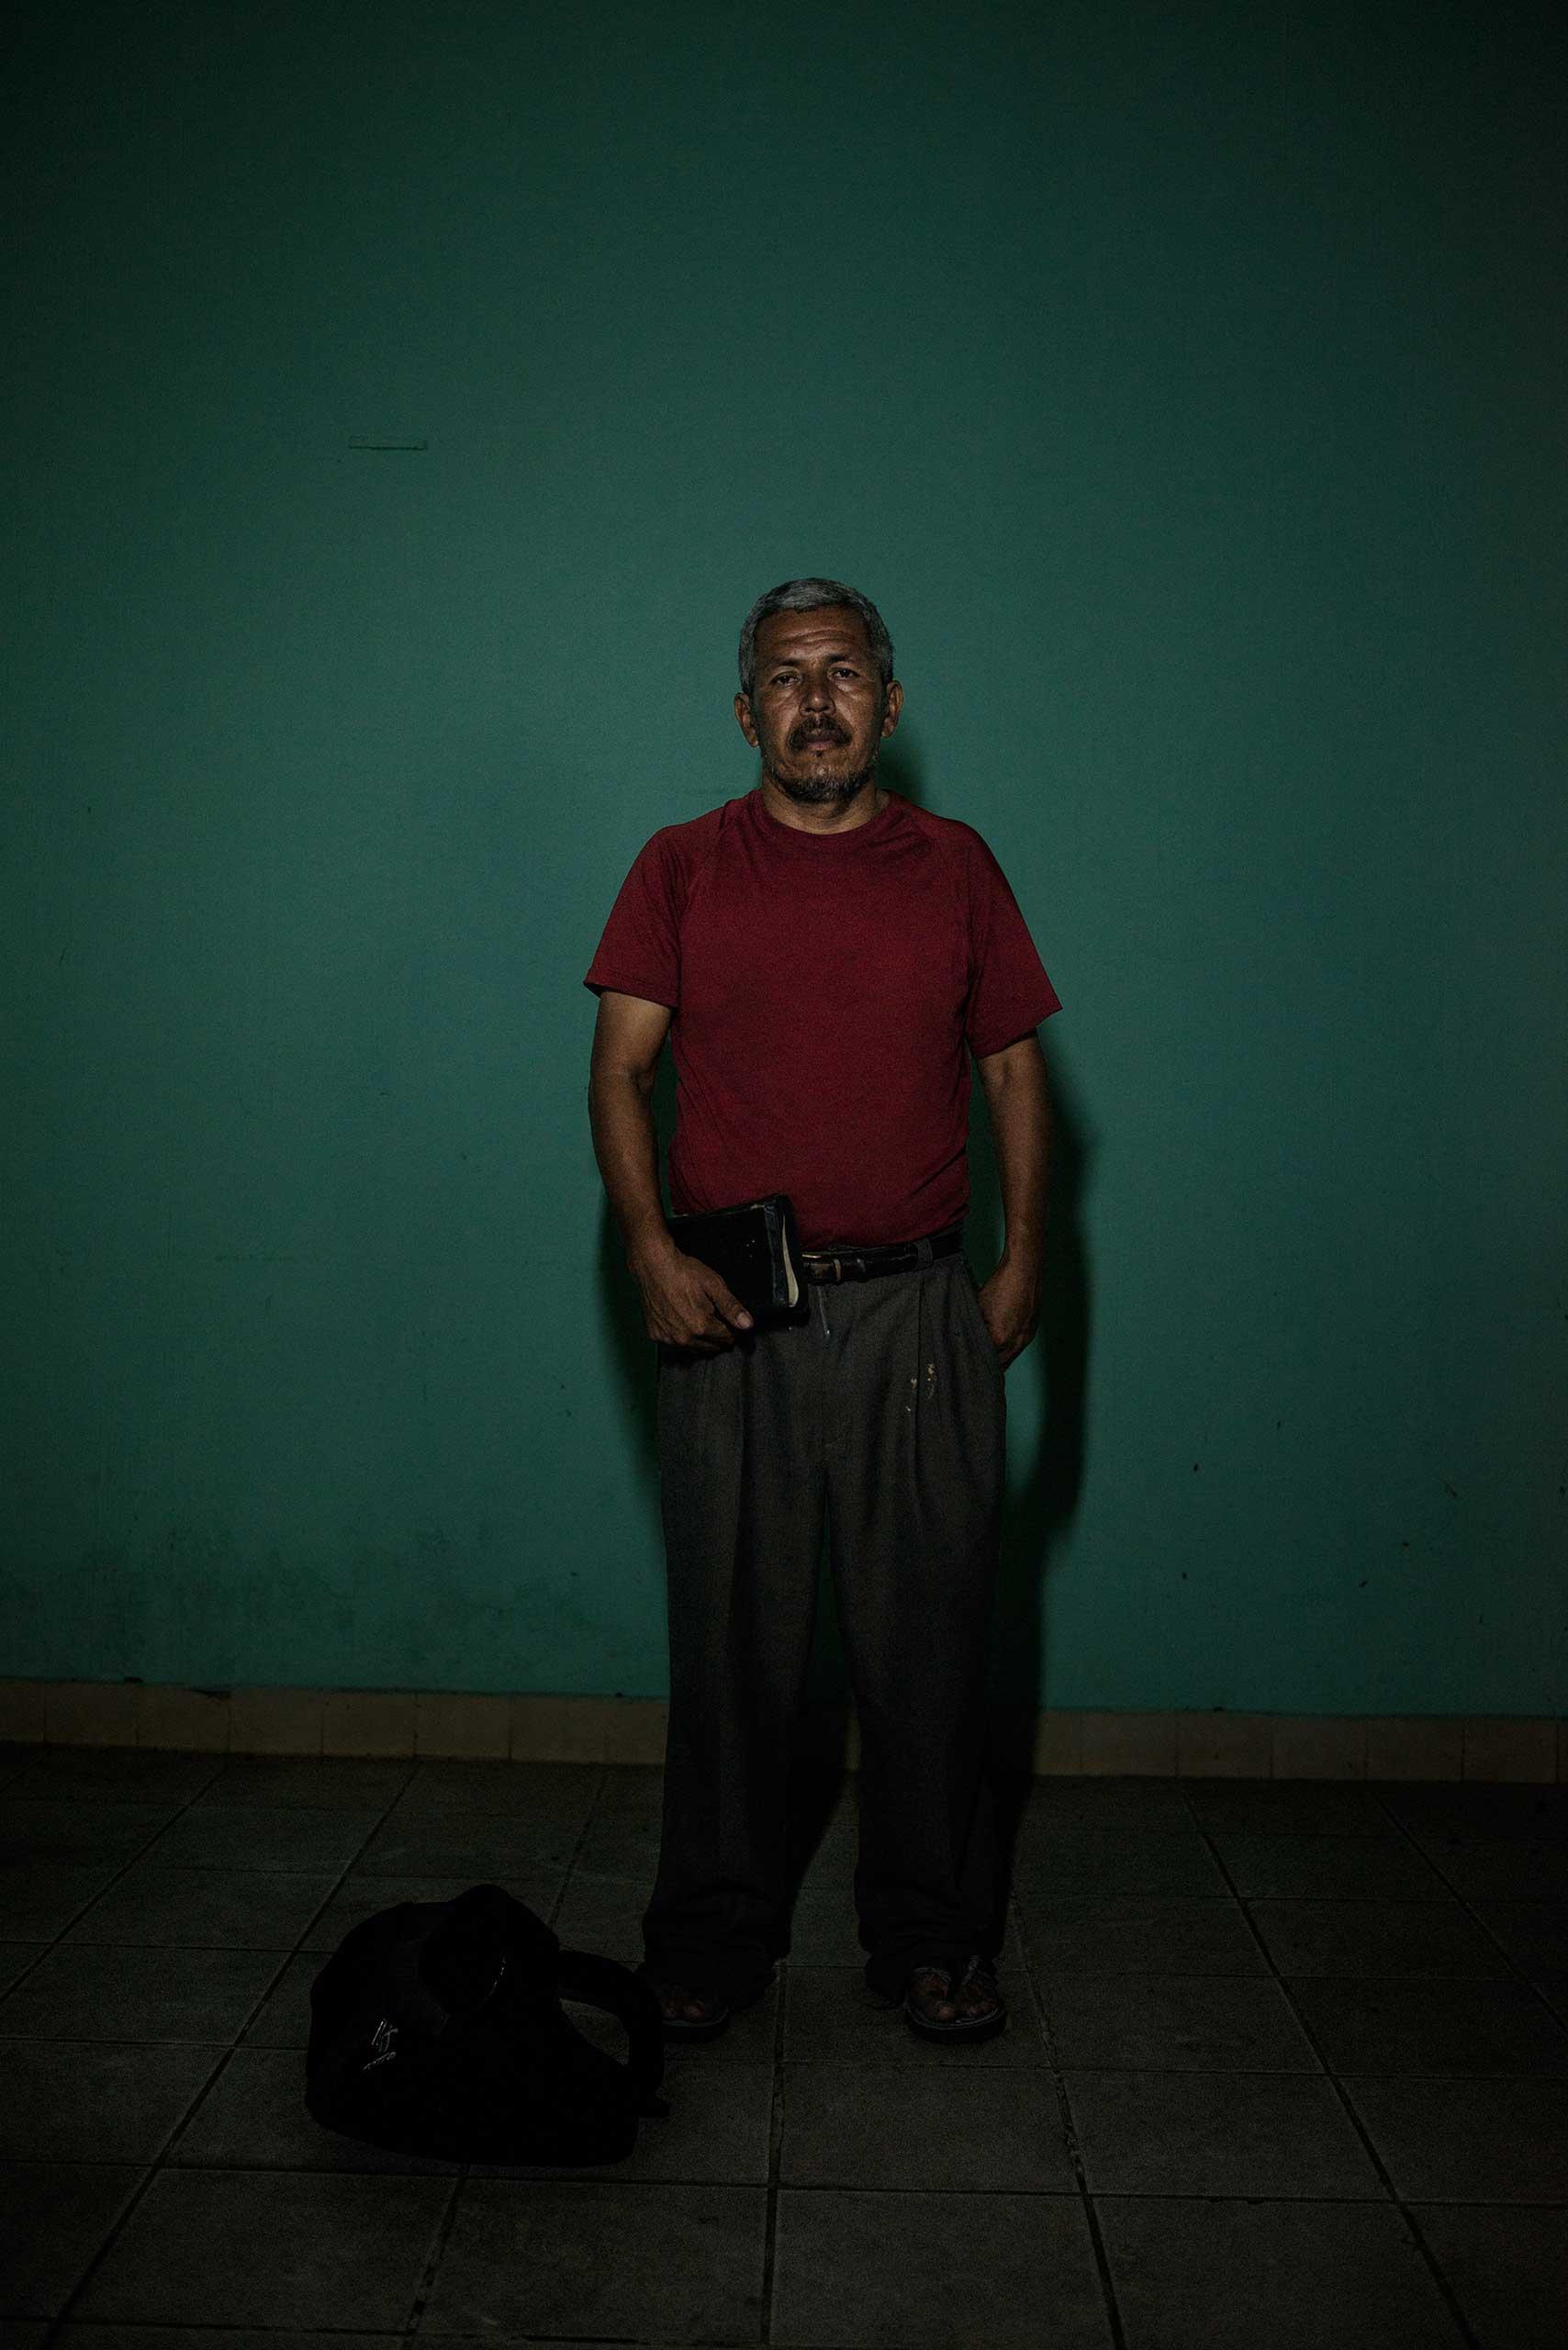 Alfredo Núñez, 46, from El Salvador.